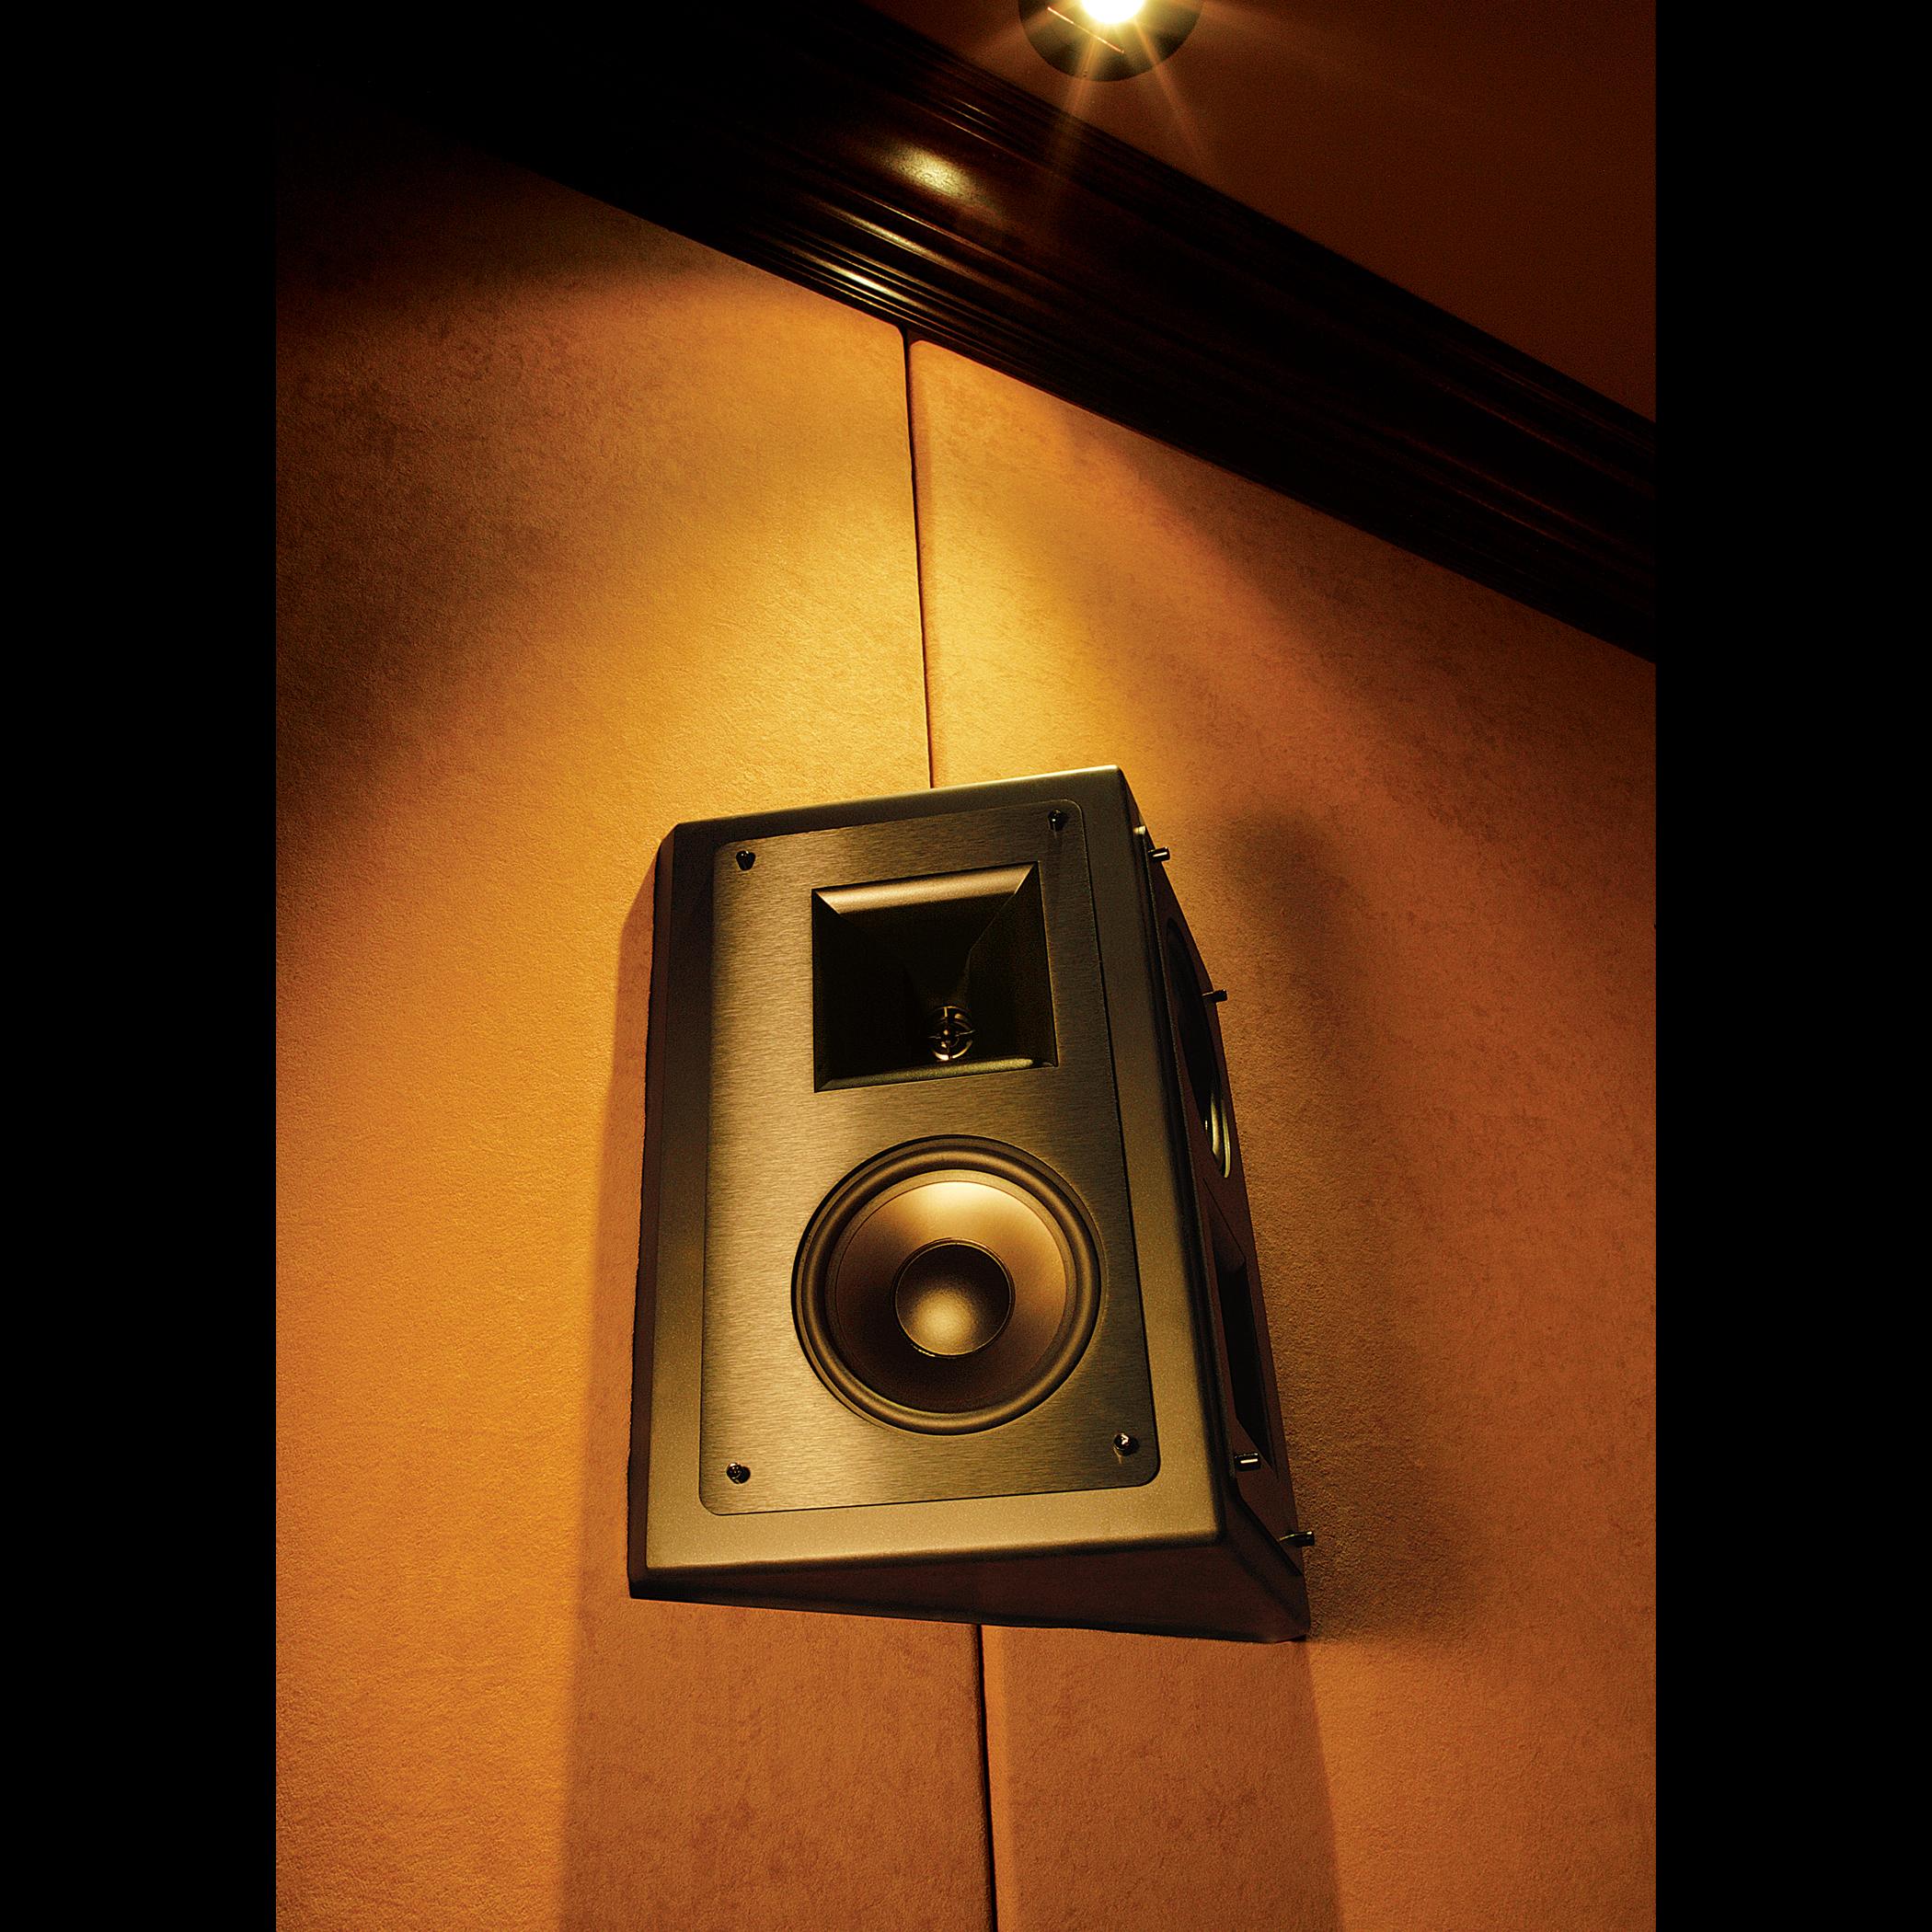 klipsch thx speakers. they\u0027re creeping up behind you. klipsch thx speakers